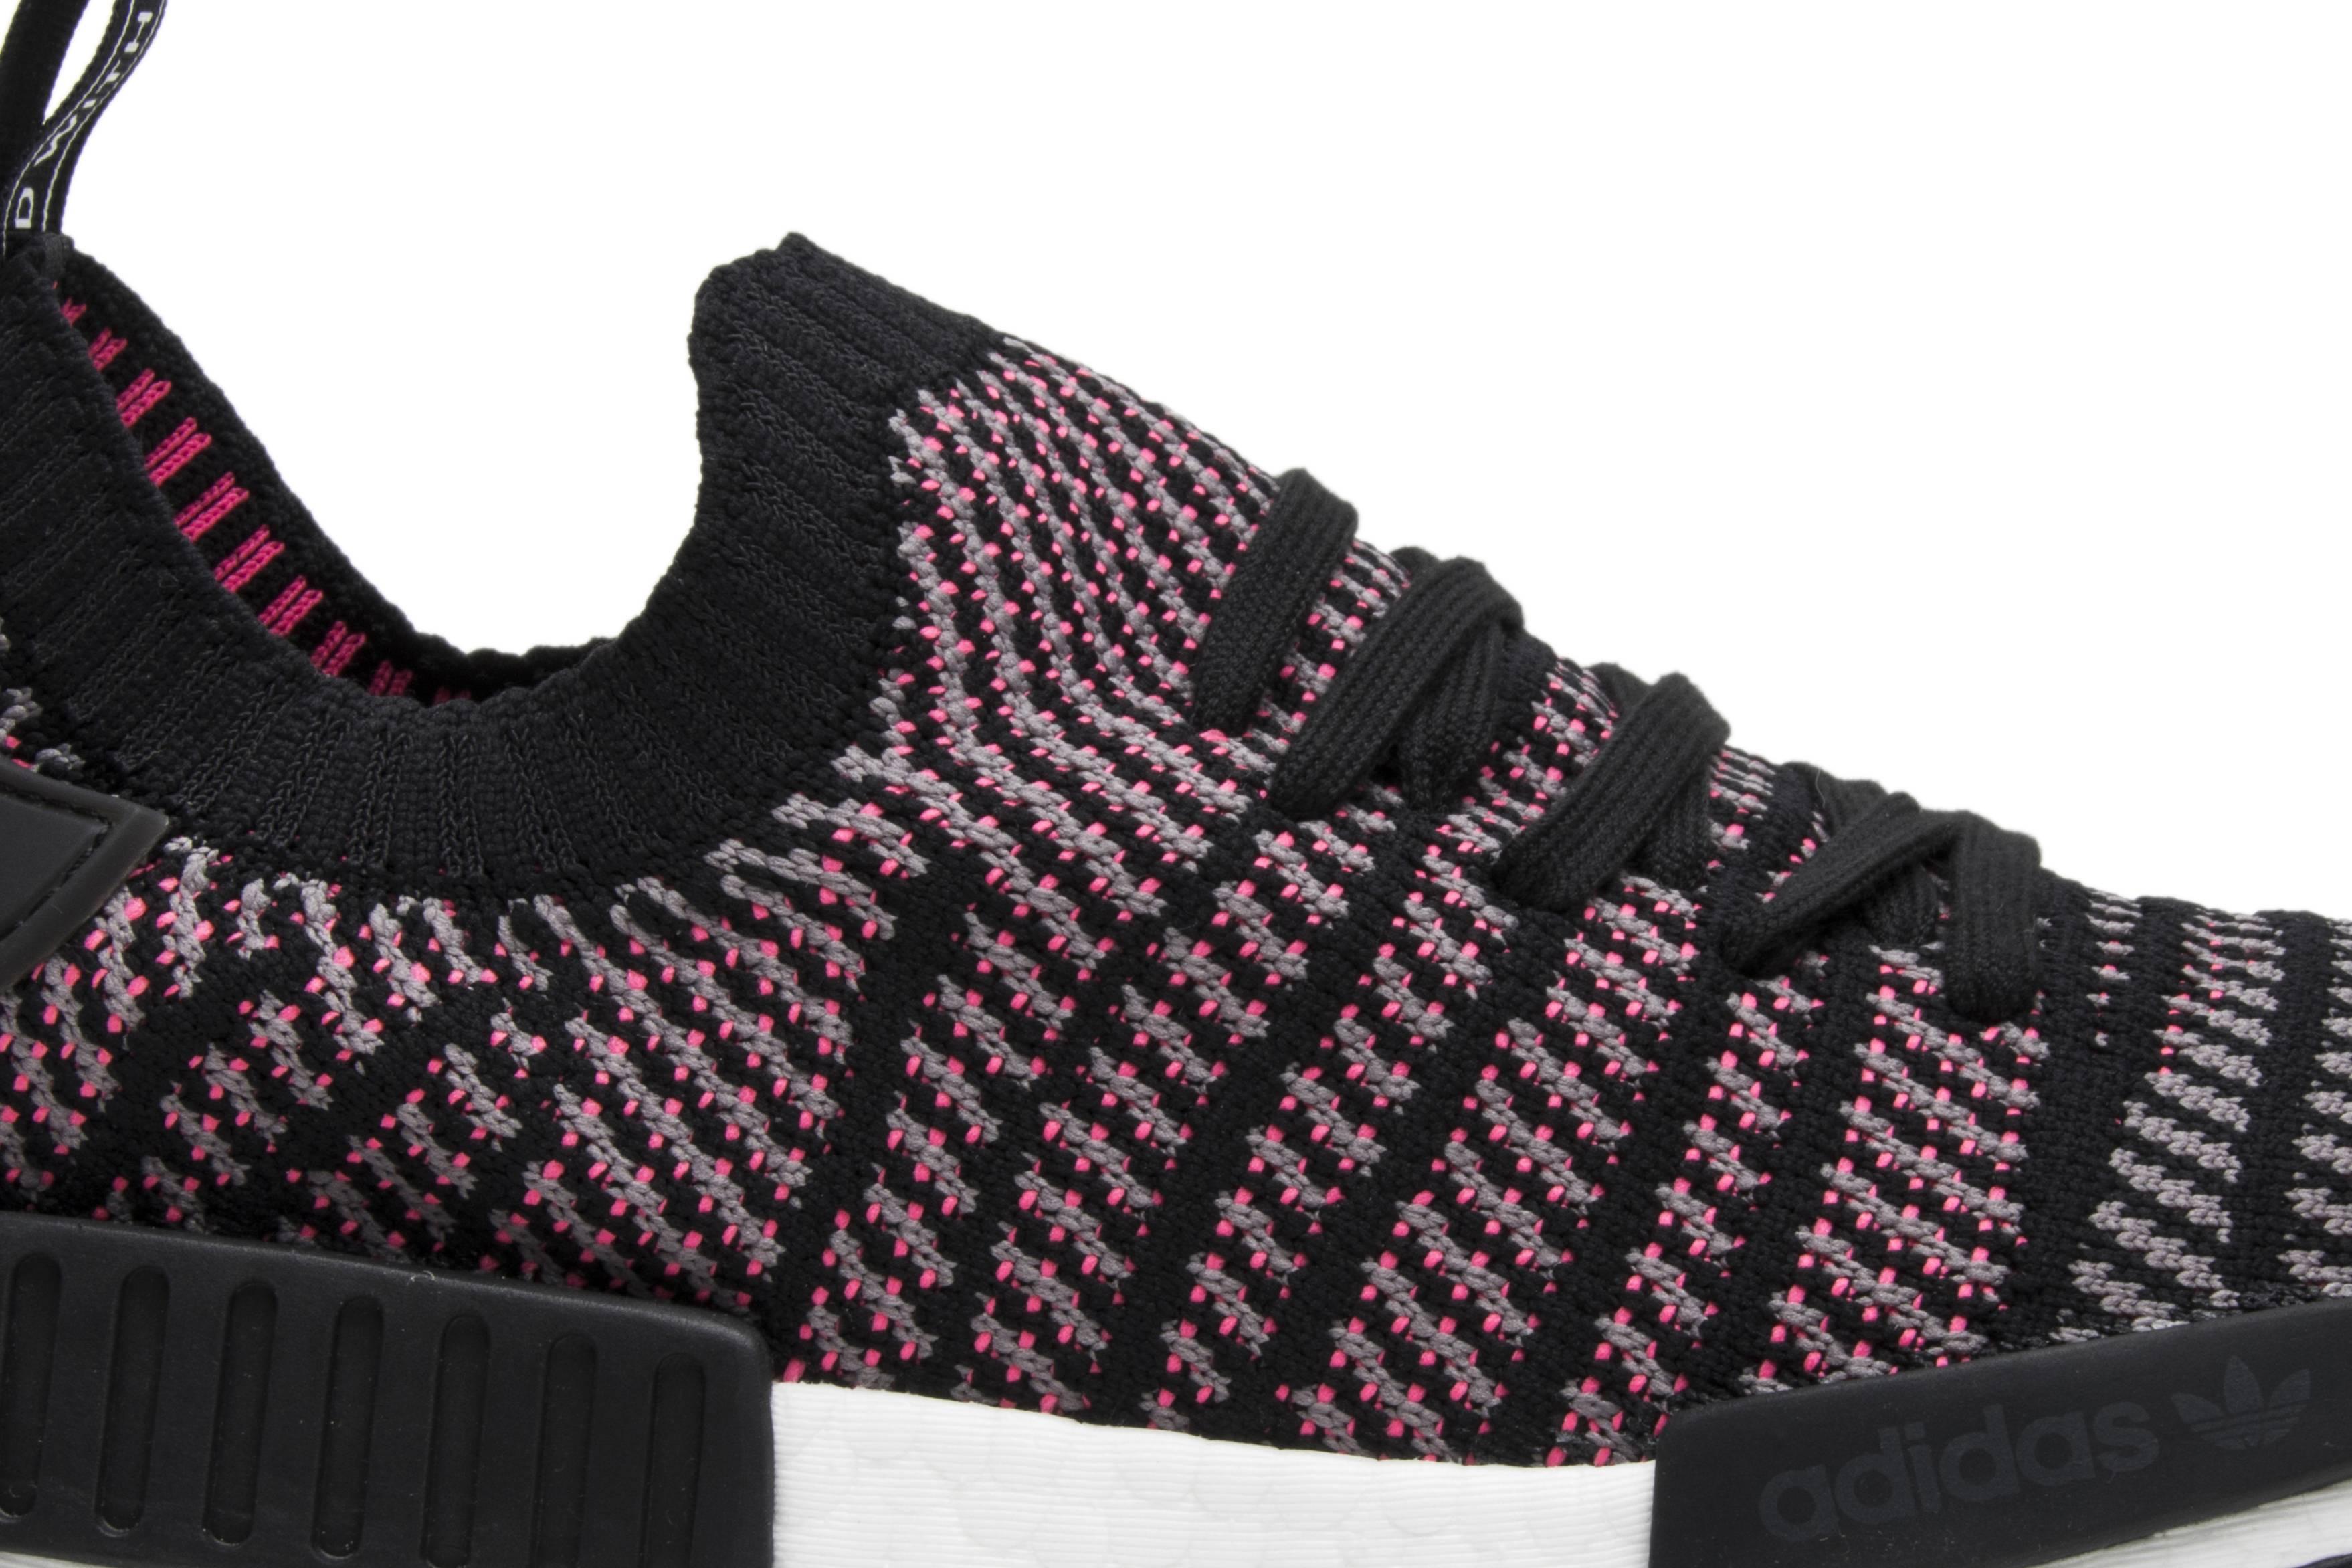 NMD R1 STLT Pink' Primeknit 'Solar Pink' STLT adidas CQ2386 | GOAT 4add93